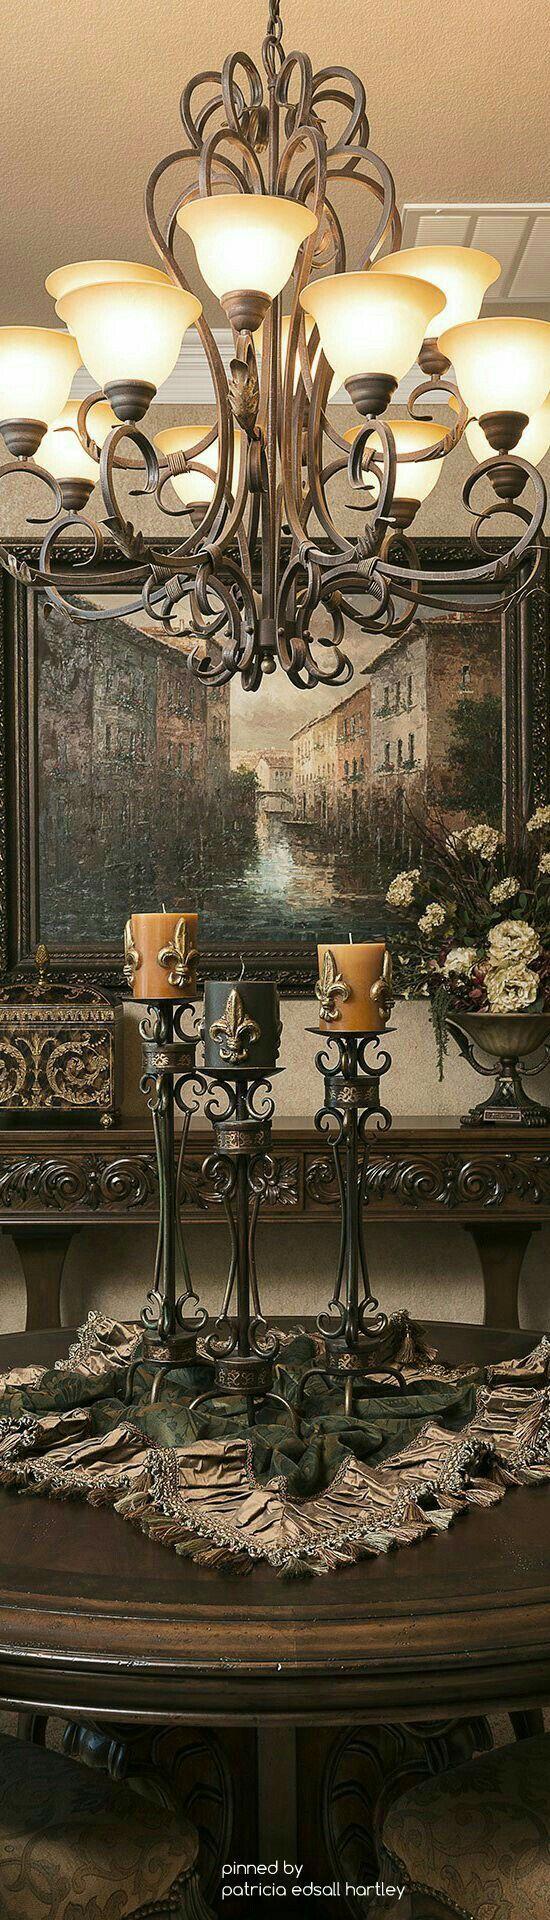 Soulmate24 Mens Style  Millionaire Boyfriends  Pinterest Pleasing Tuscan Lighting Dining Room Inspiration